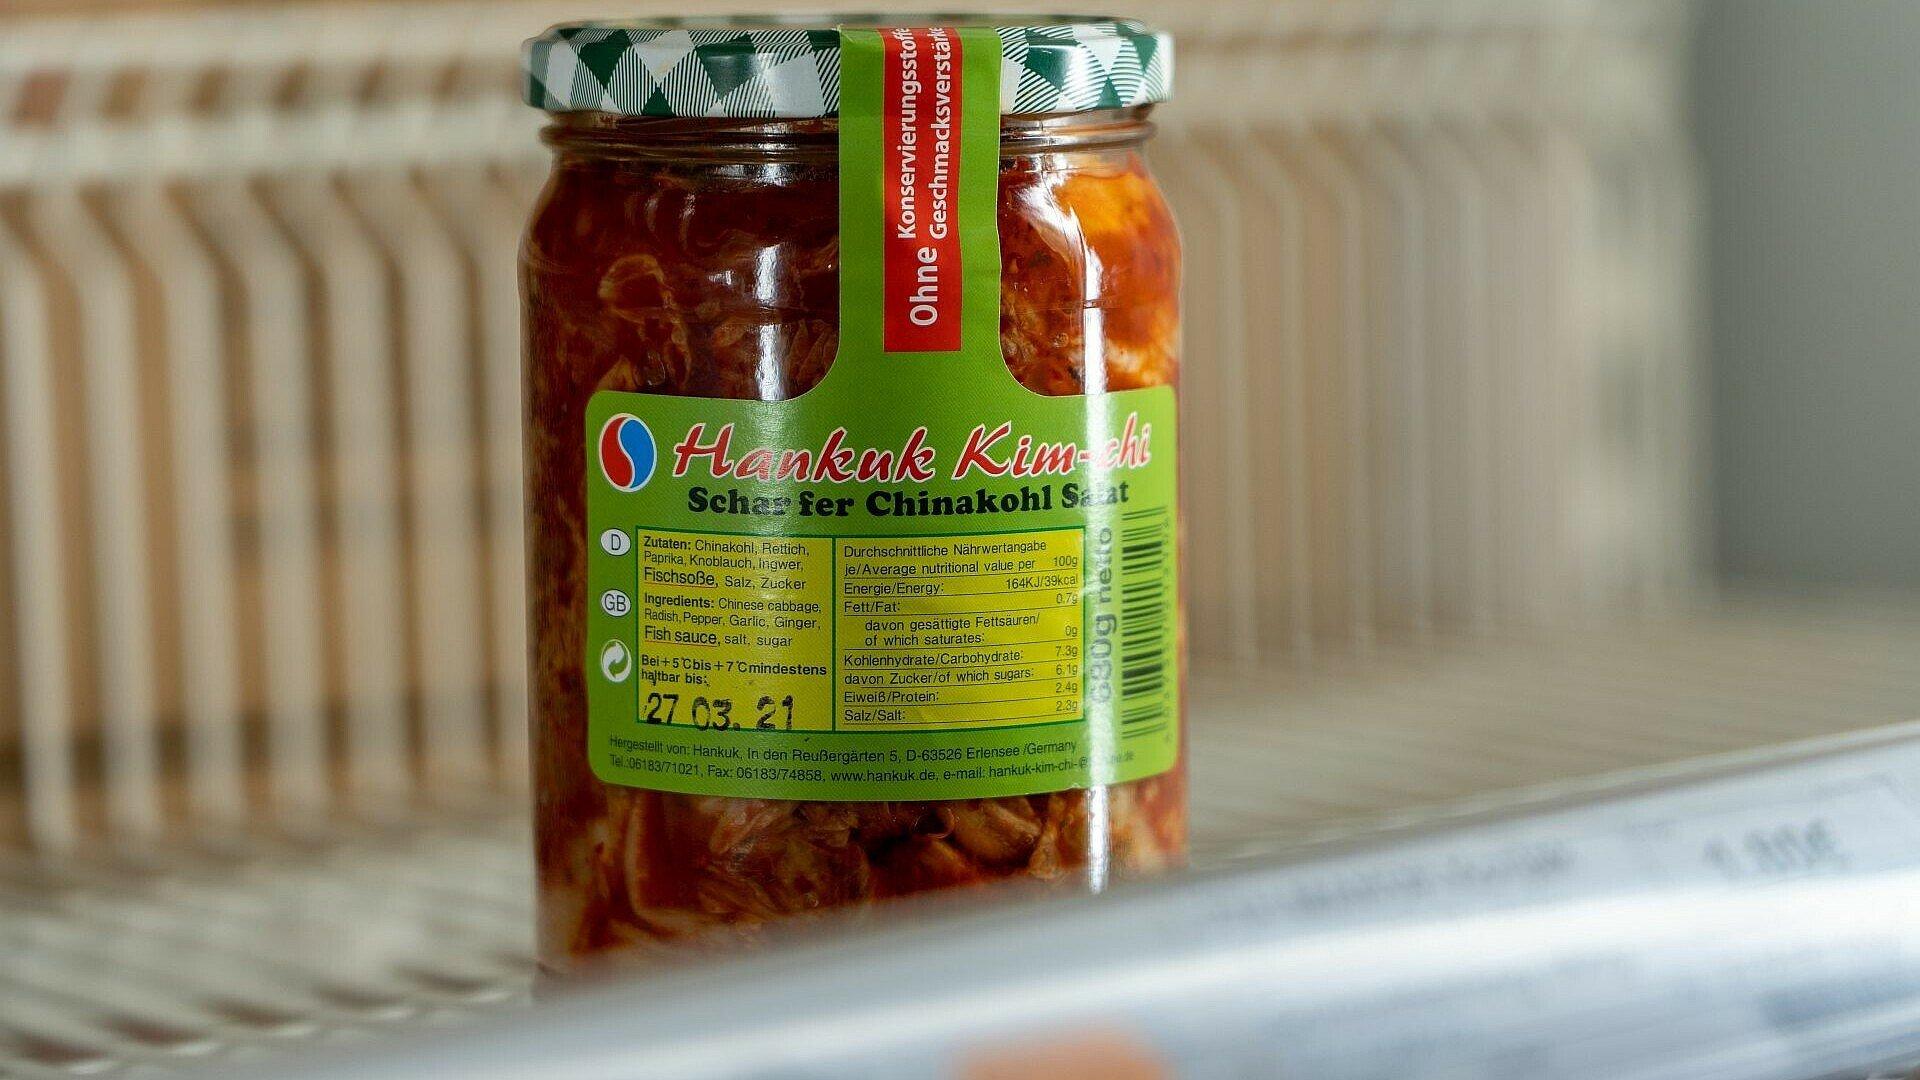 Glas mit Kimchi im Heng Long Supermarkt in Lindenthal